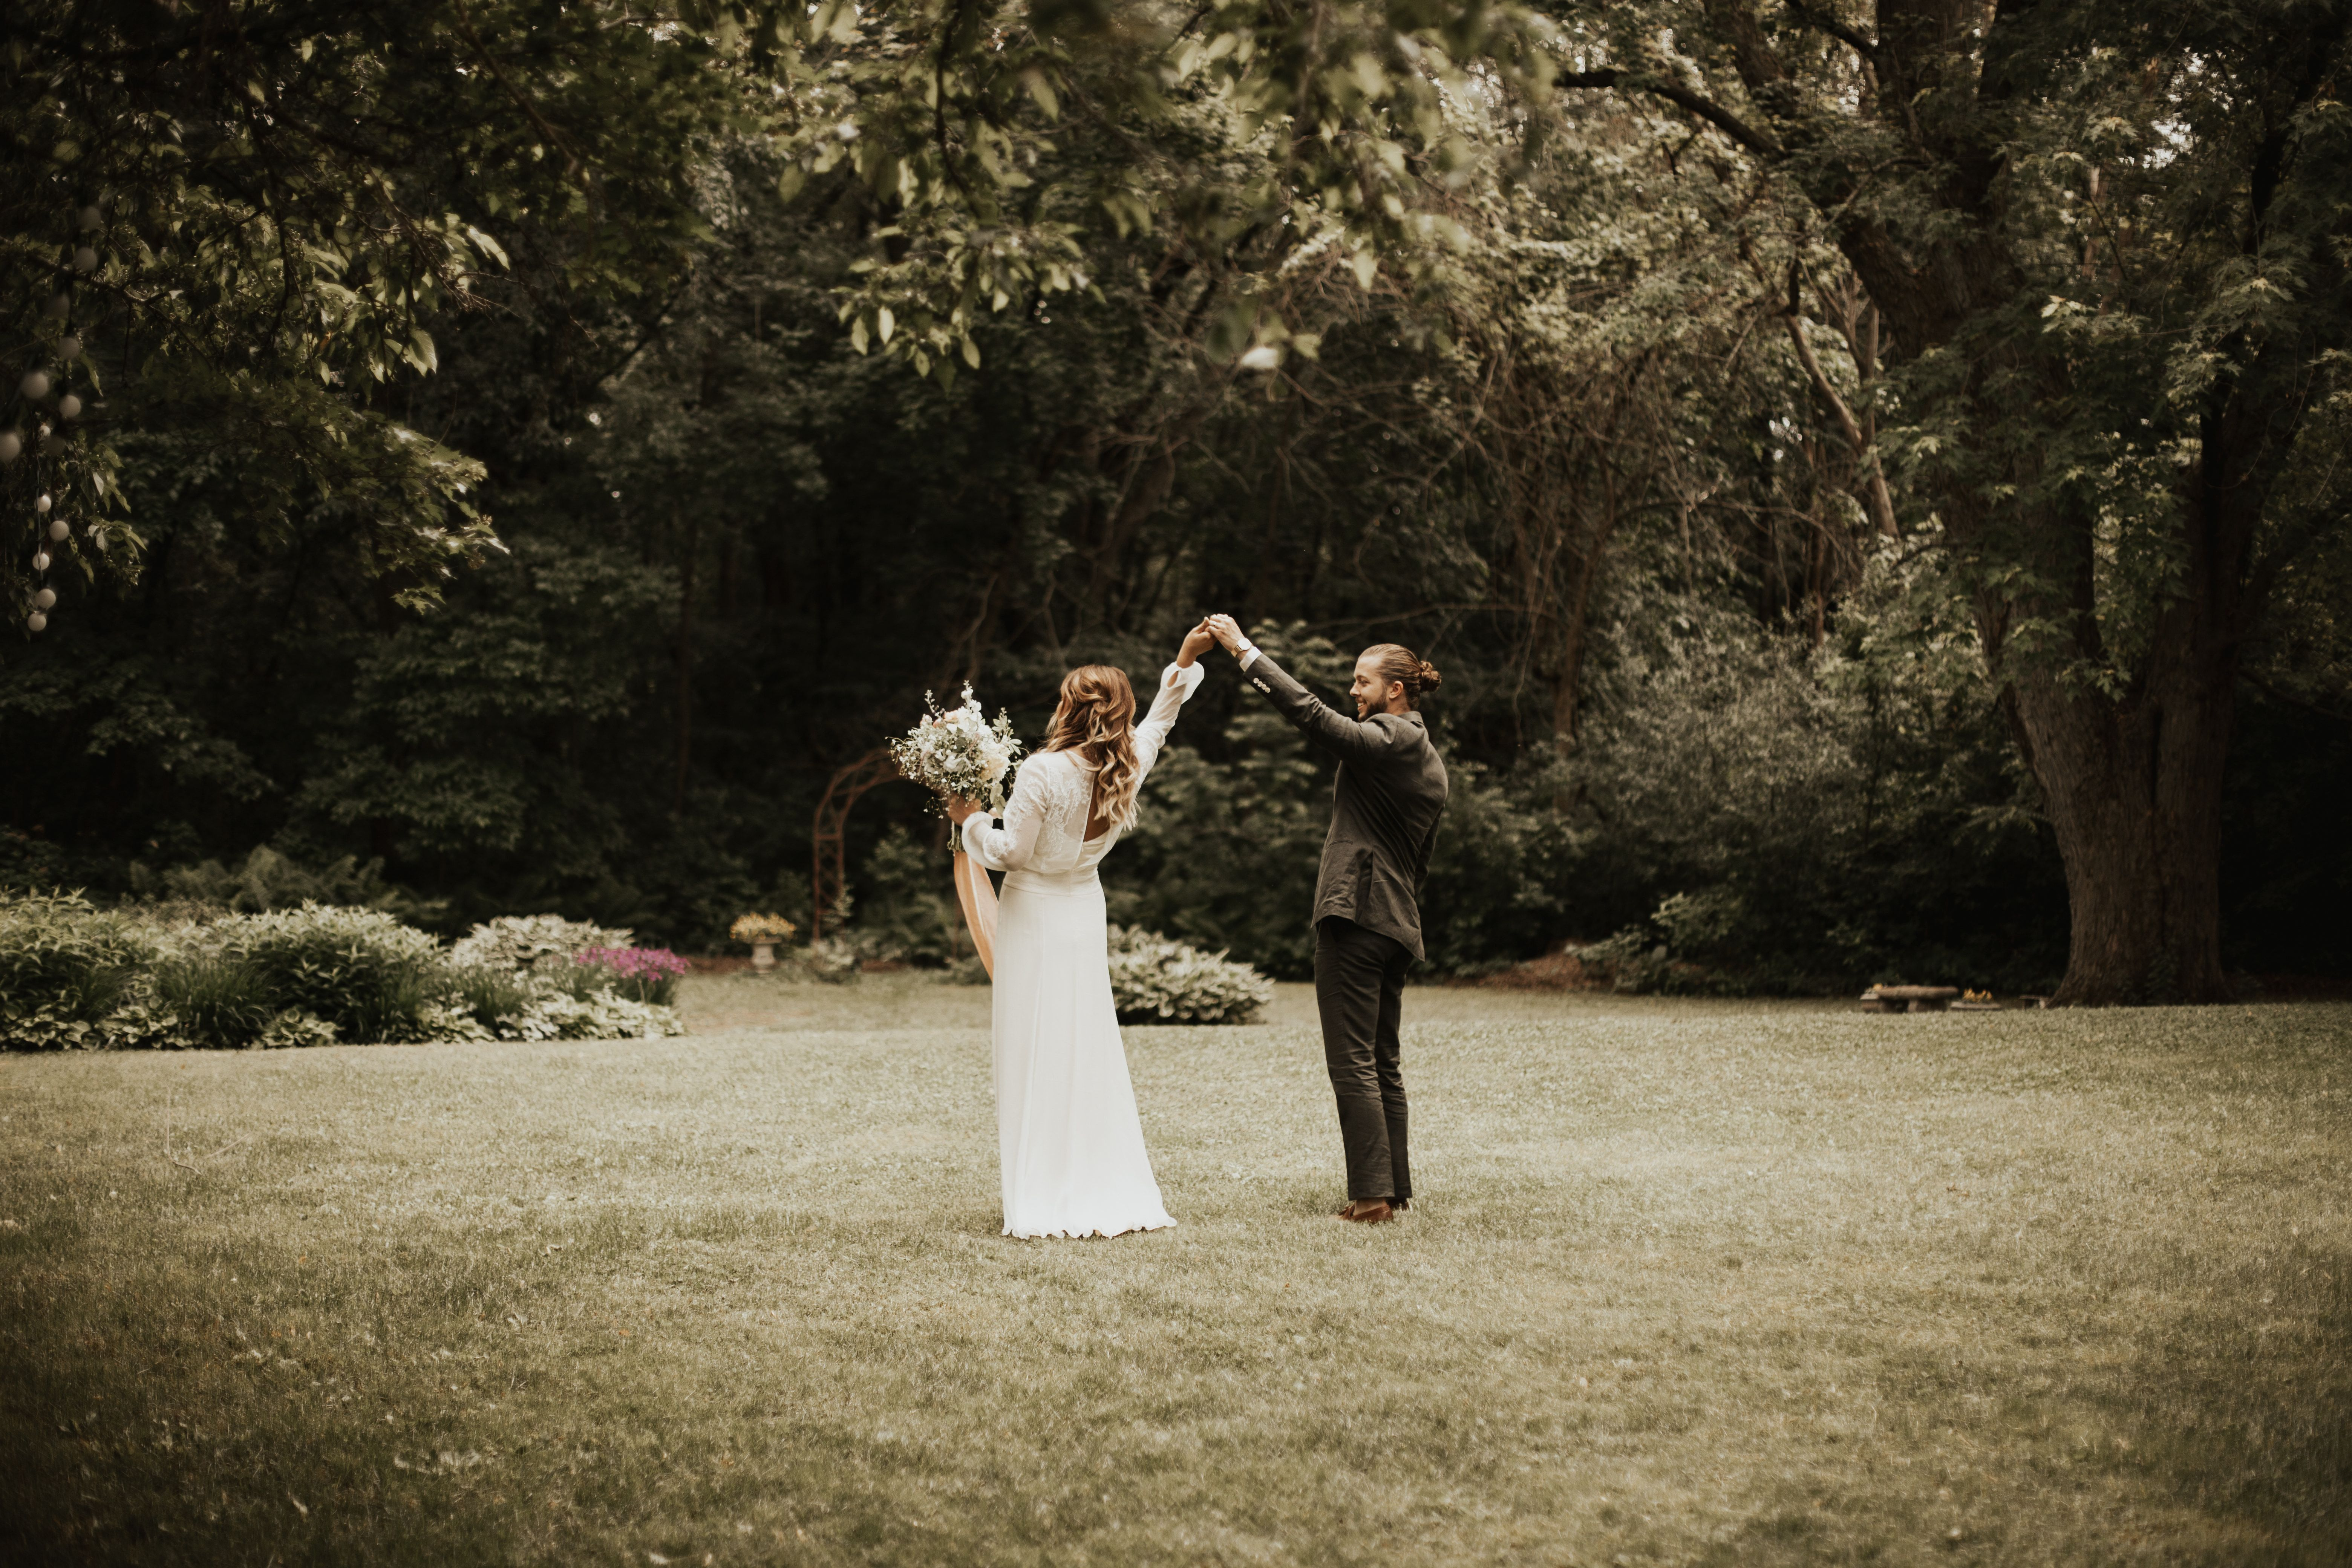 Vt long sleeve edwardian inspired wedding dress in